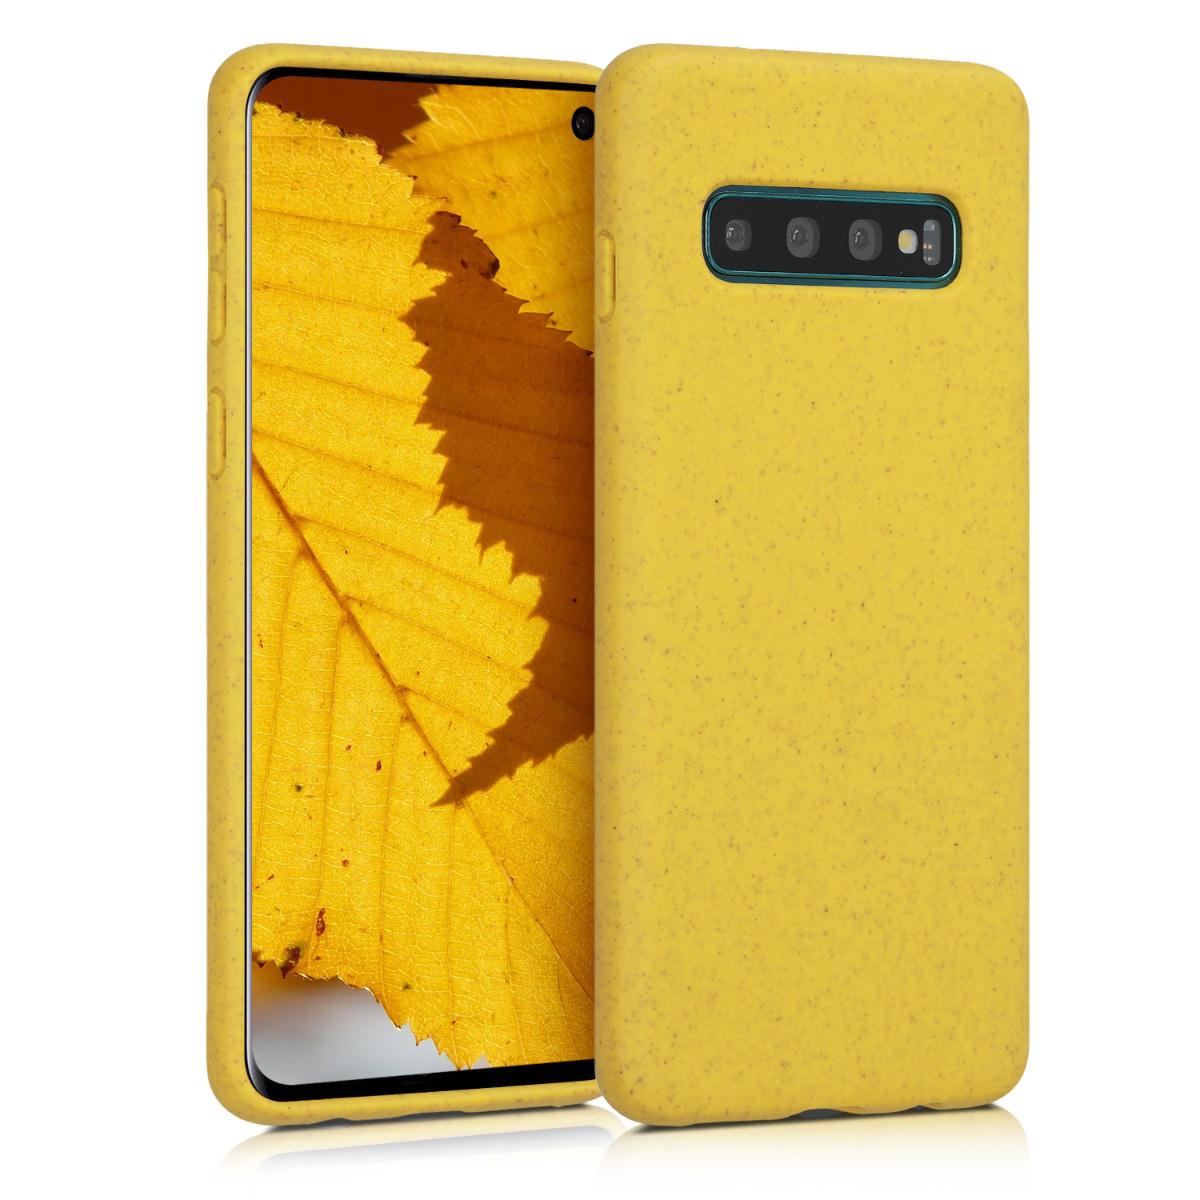 Pouzdro / obal for Samsung Galaxy S10